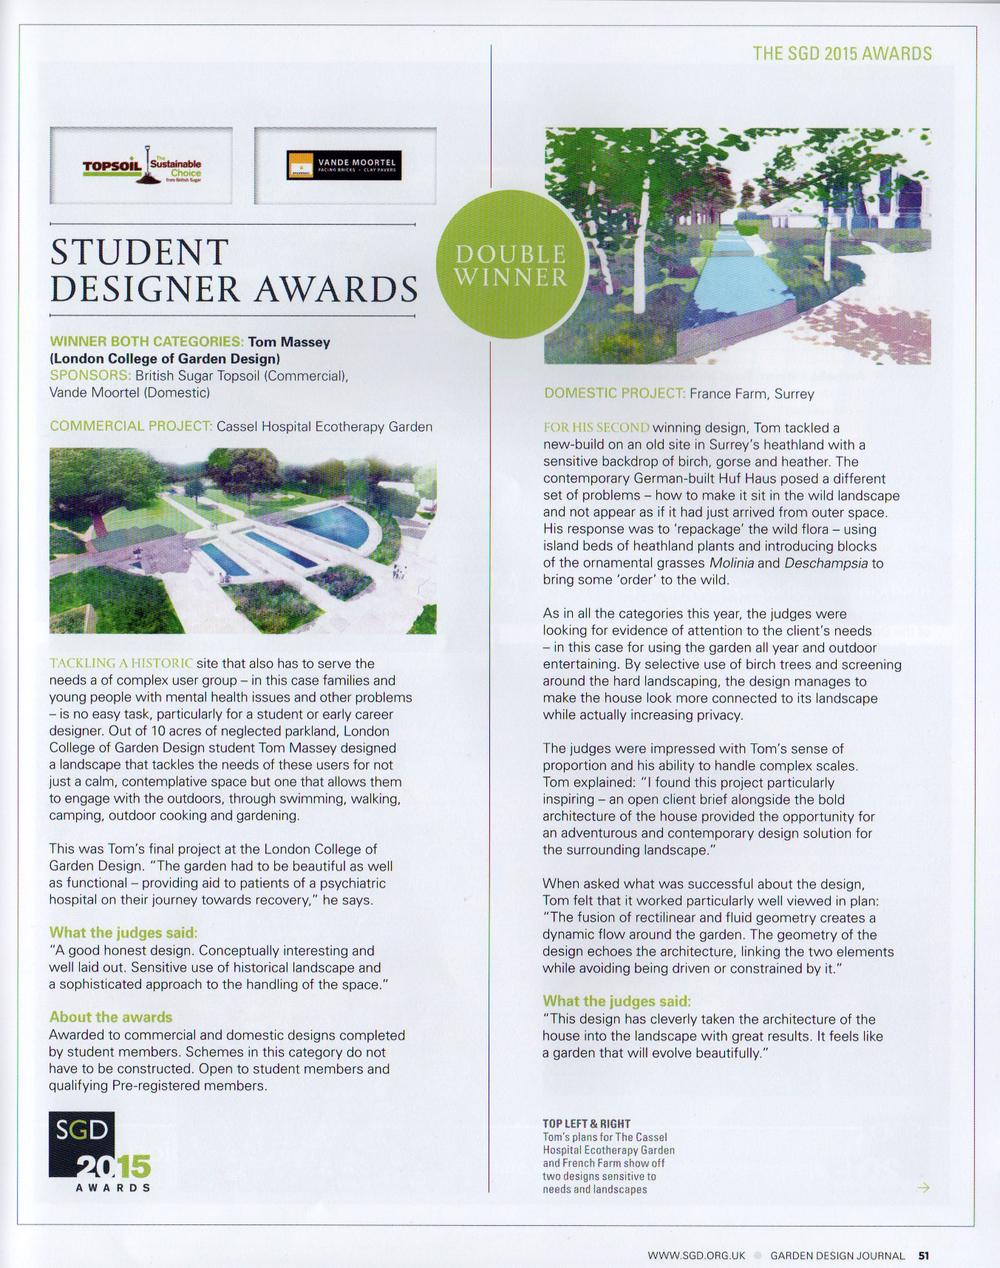 SGD Garde Design Journal Article